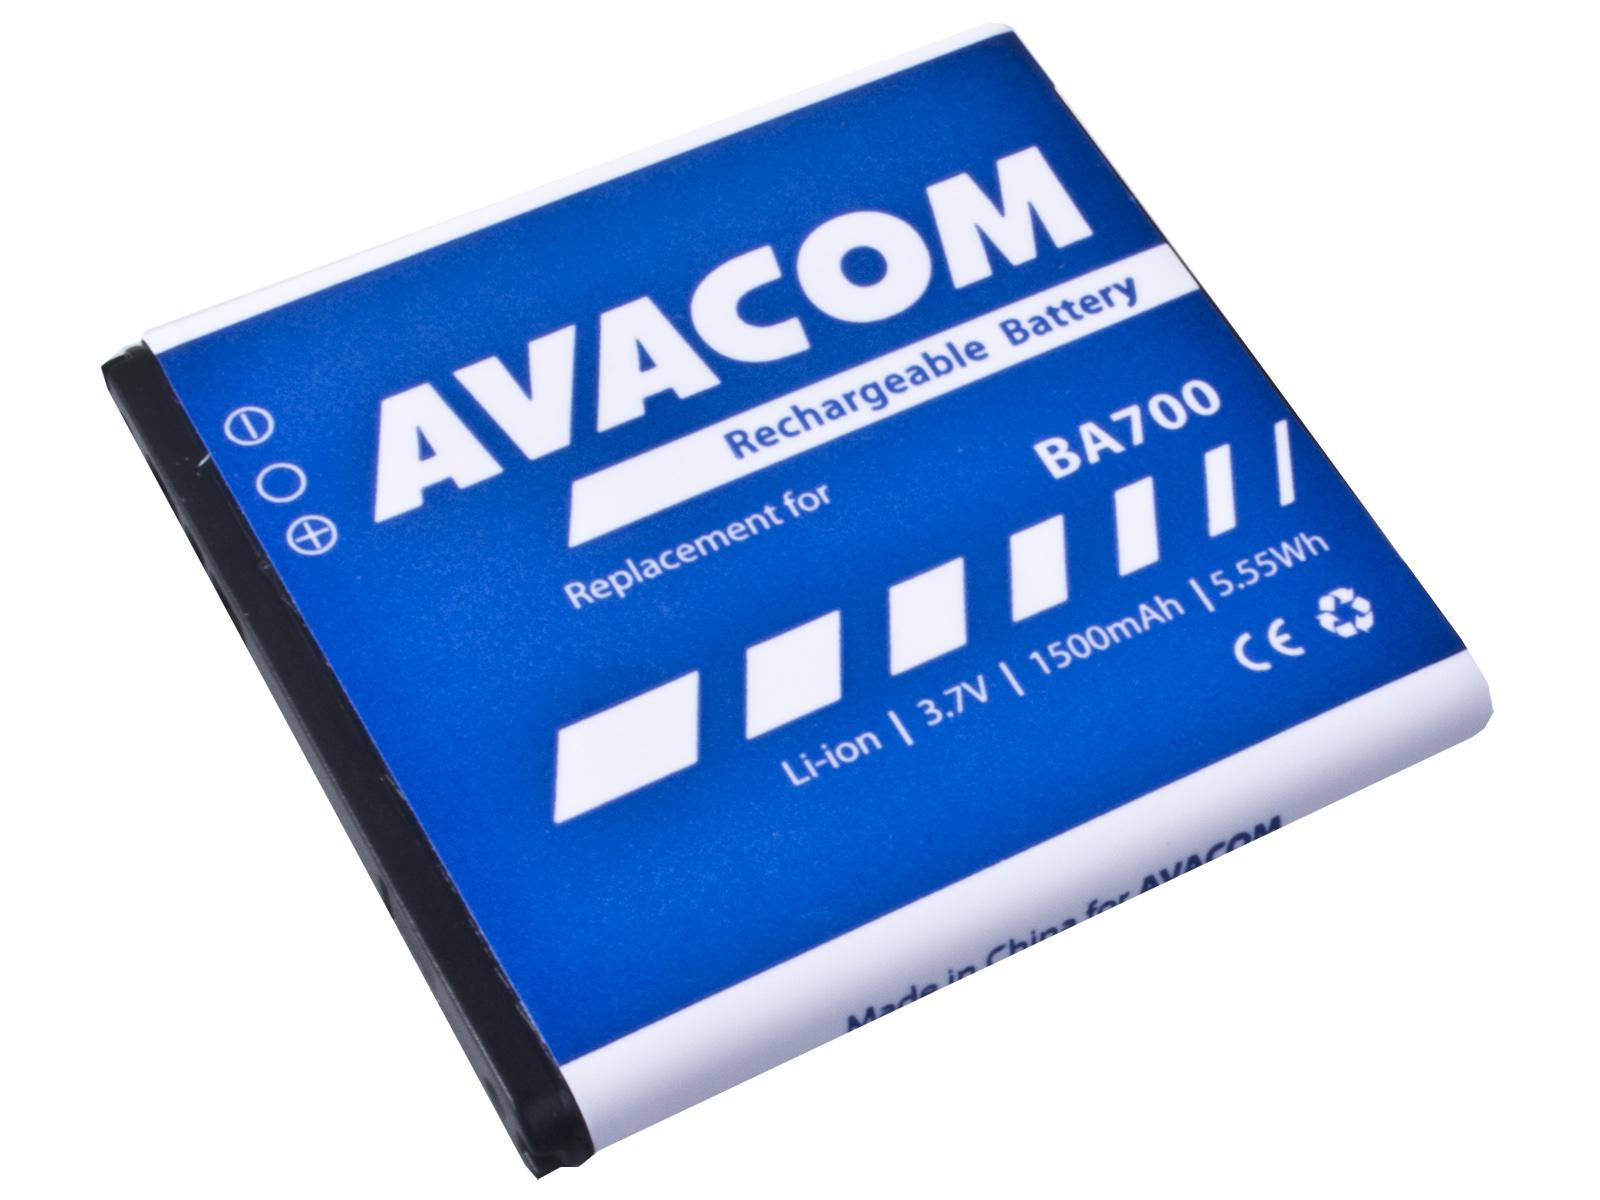 Baterie AVACOM GSSE-NEO-1500A do mobilu Sony Ericsson Xperia Neo, Pro, Ray Li-Ion 3,7V 1500mAh